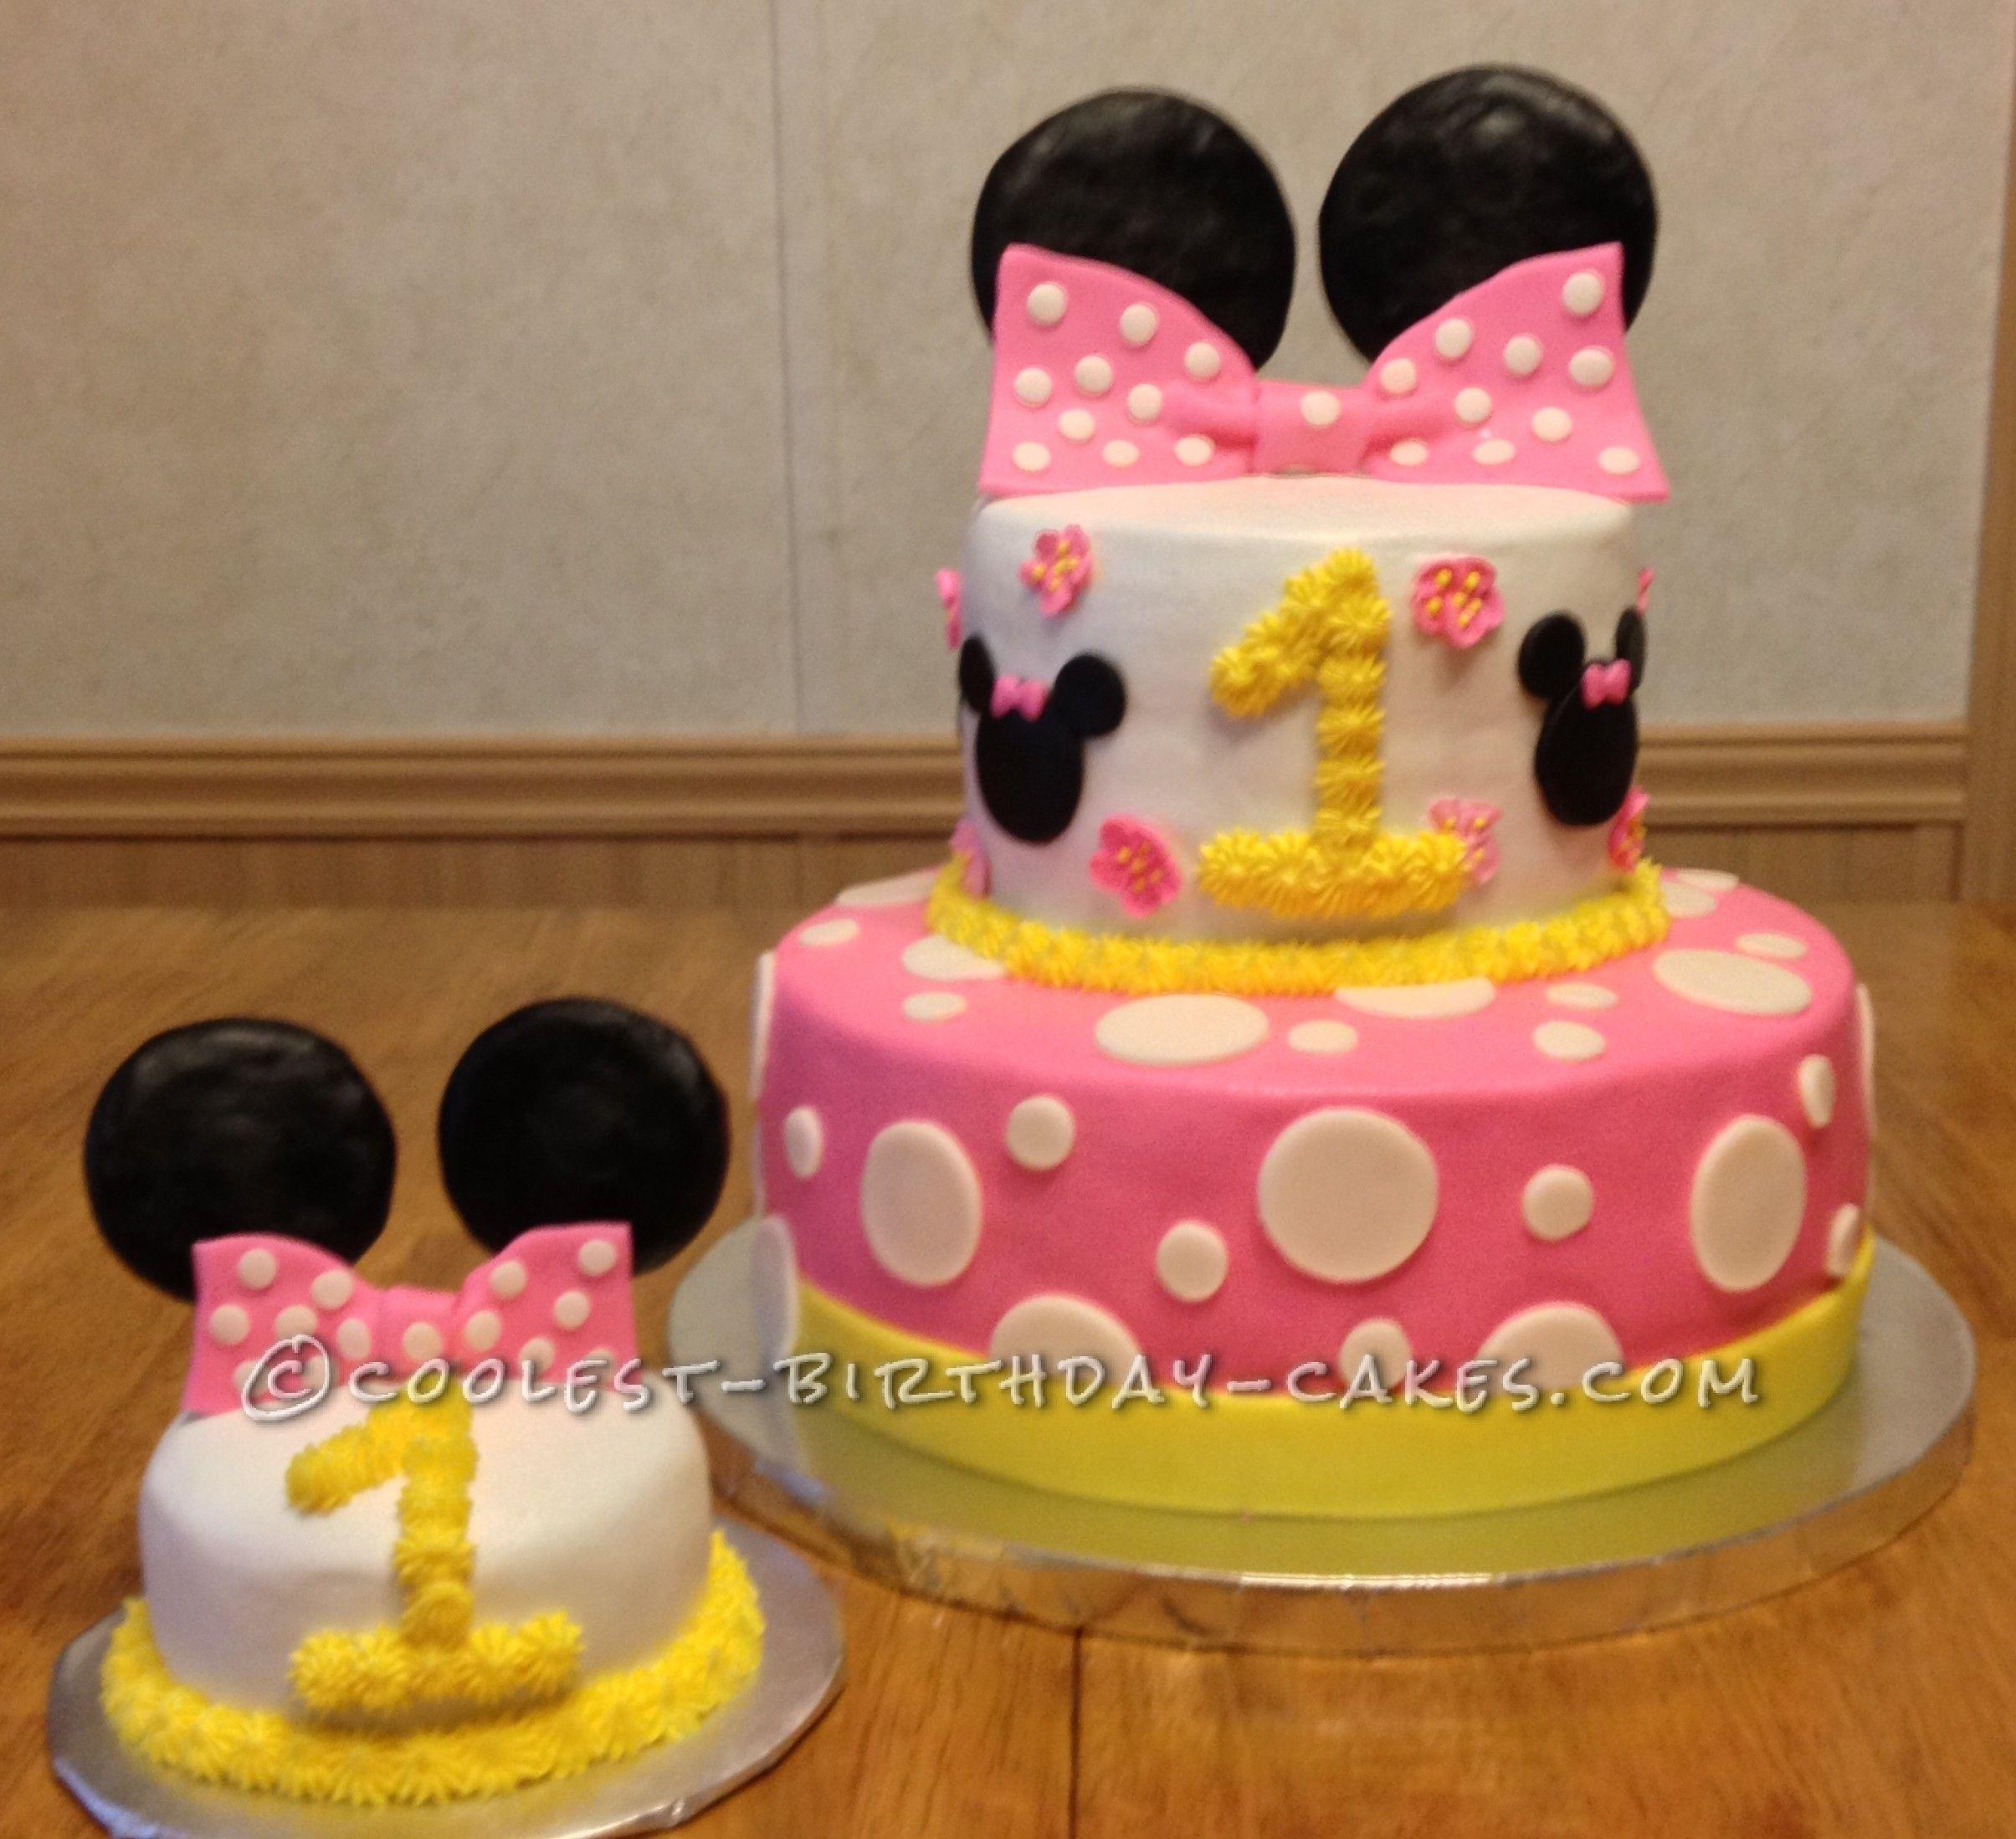 Coolest Minnie Mouse 1st Birthday Cake 1st Birthday Cakes Minnie Mouse 1st Birthday Minnie Mouse First Birthday